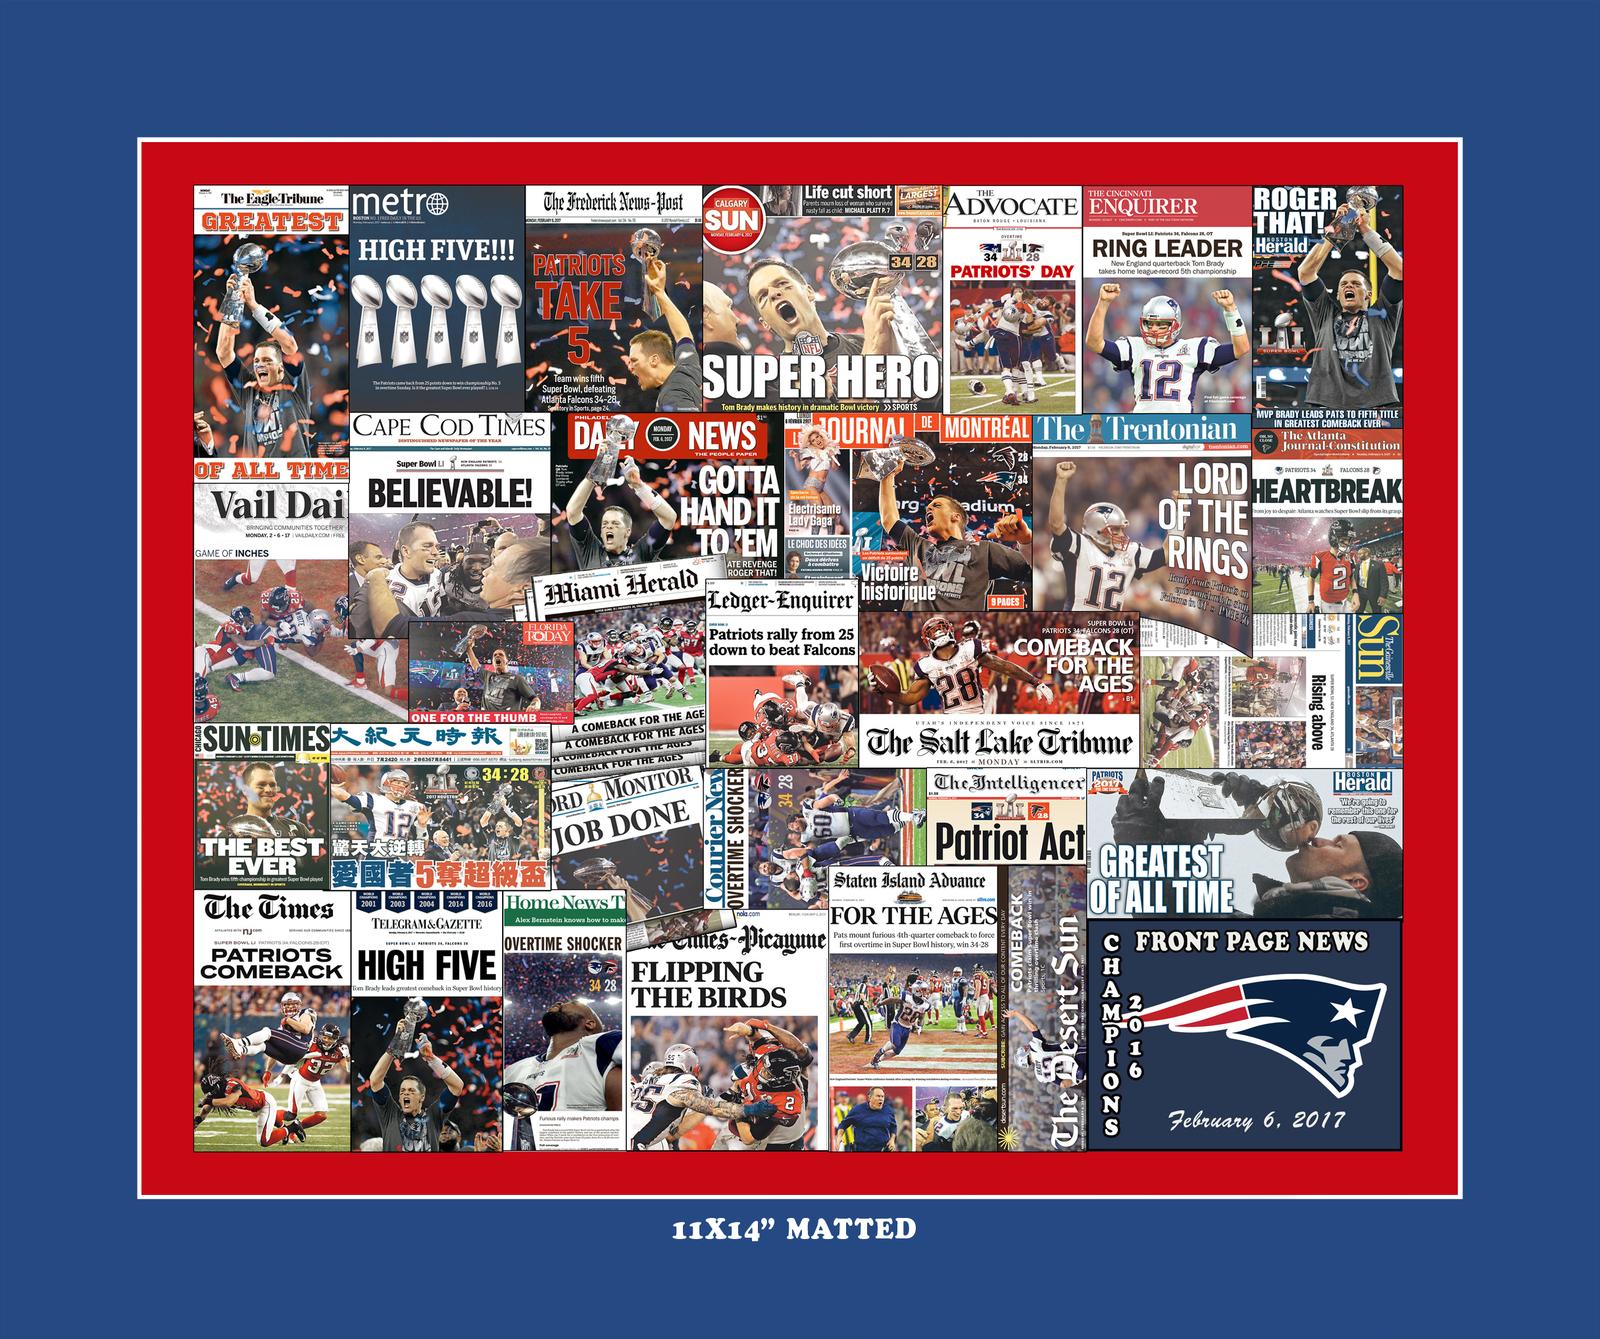 New England Patriots 2017 Super Bowl Newspaper Headline Collage Print.